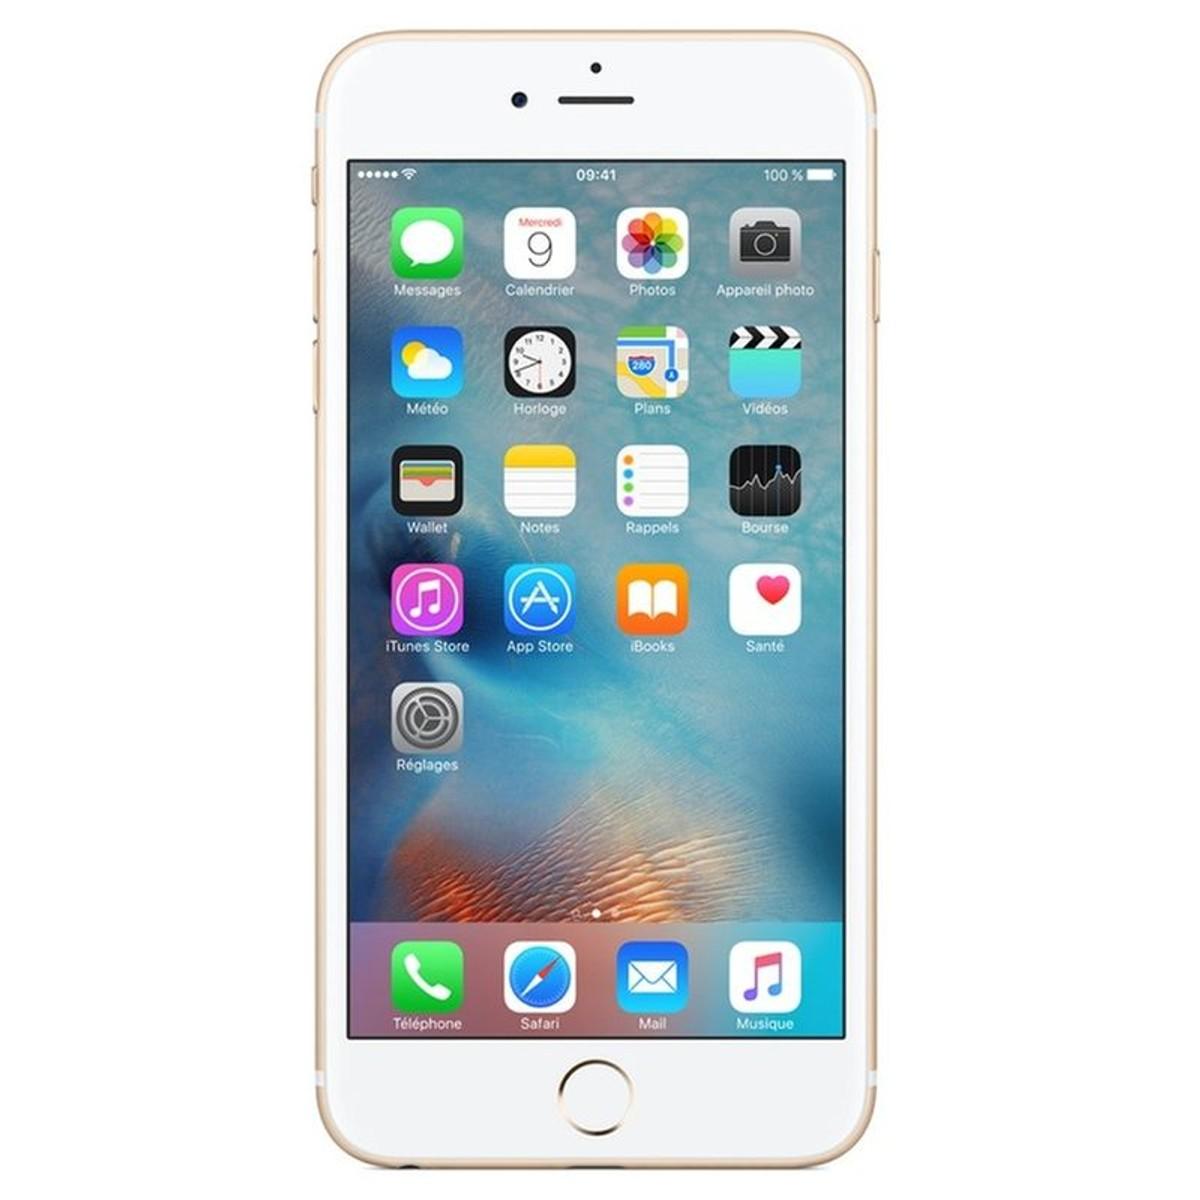 Smartphone Apple Iphone 6s Plus Gold 128go Taille TU